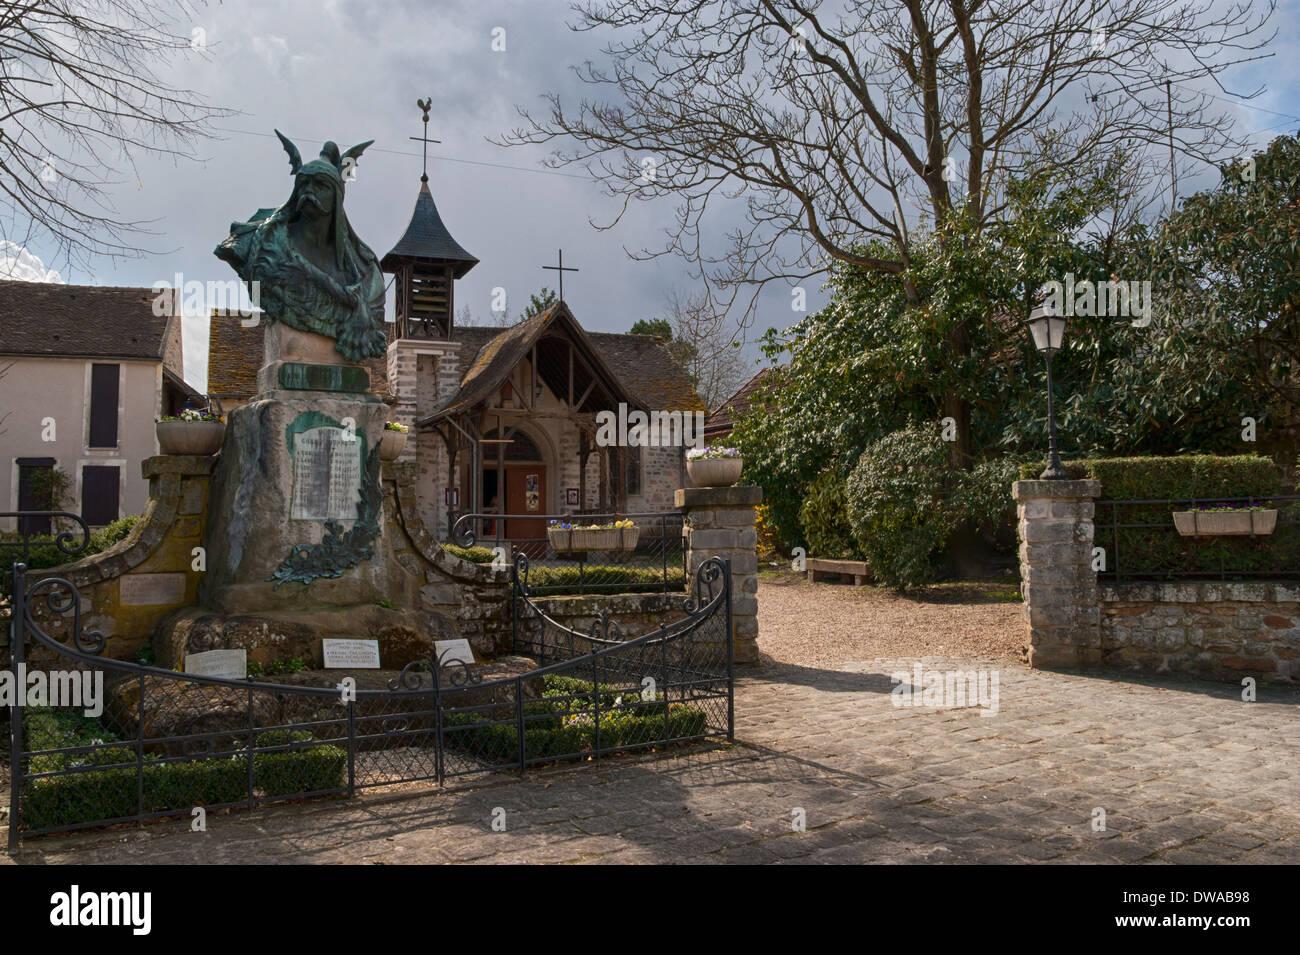 Barbizon France  city images : War Memorial At Barbizon, France. The 3 Symbols Of France Stock Photo ...